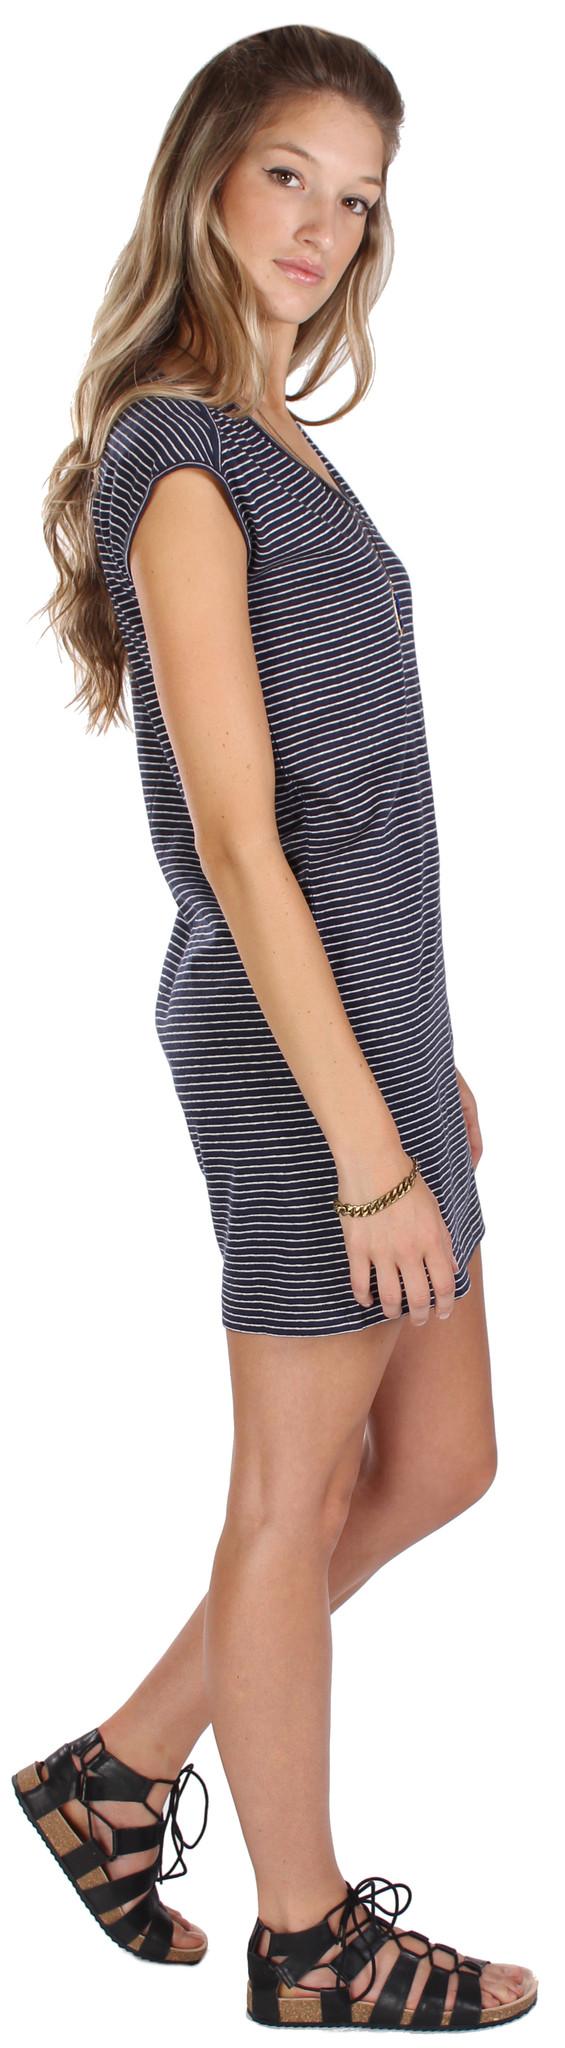 Rag & Bone Anya Striped Dress